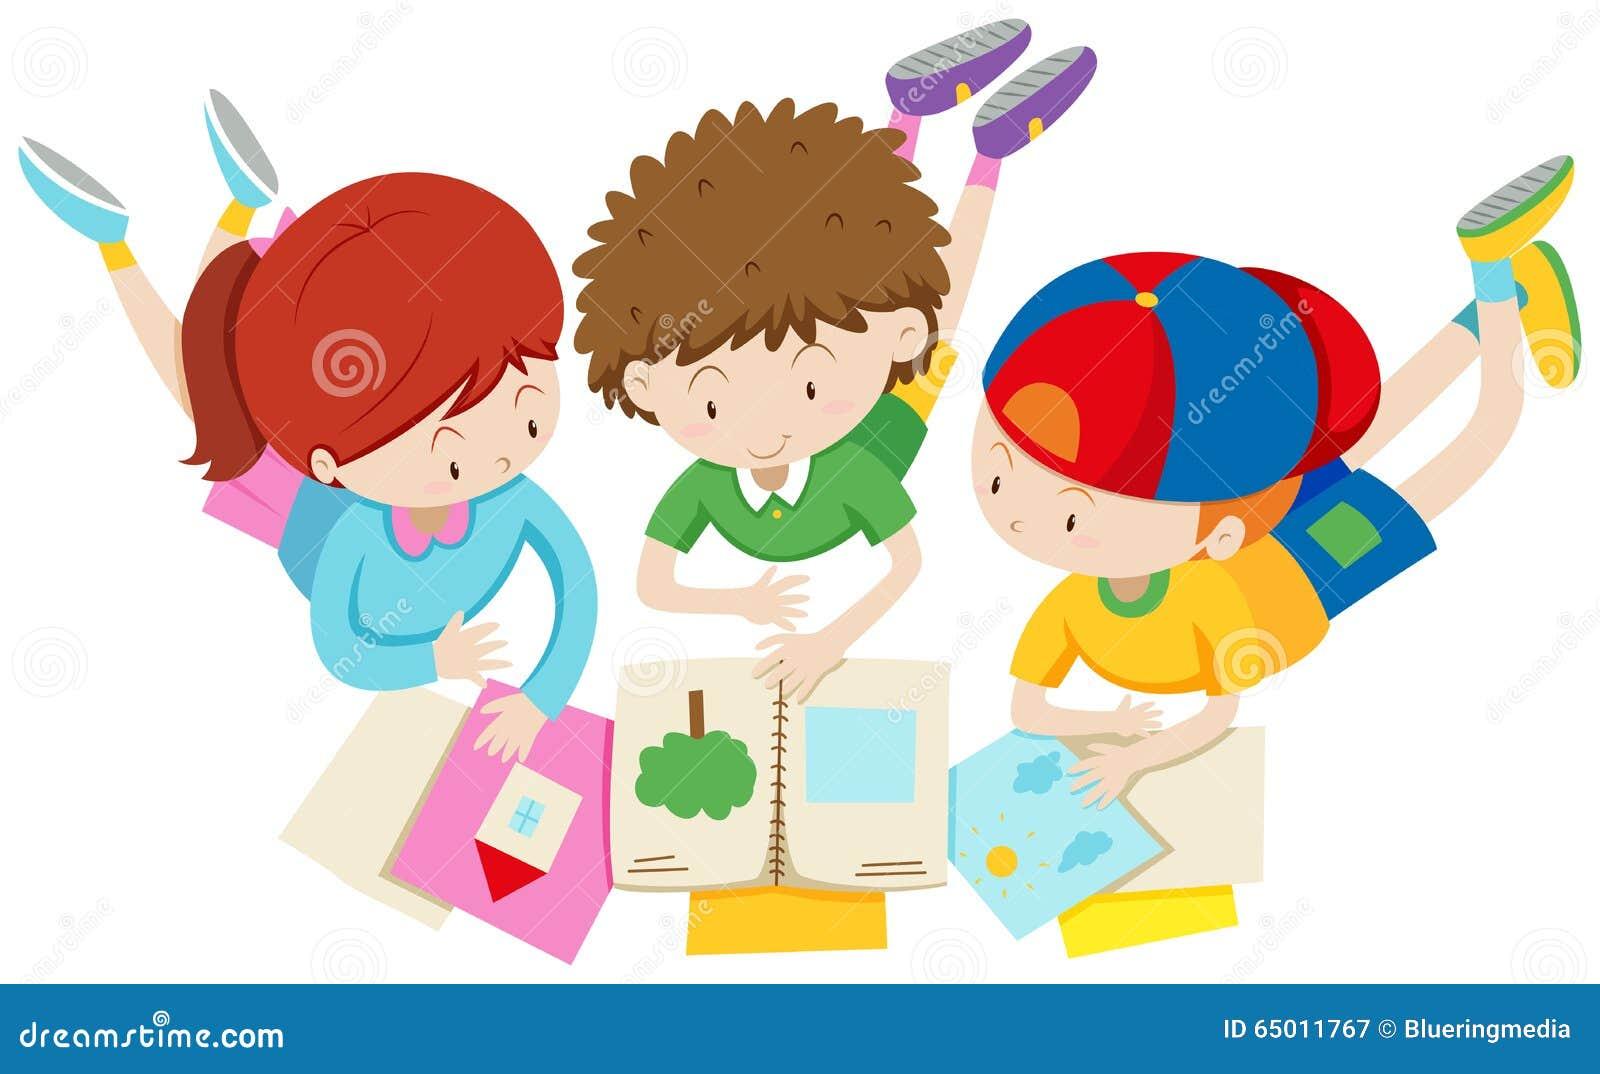 children discussion images - photo #29